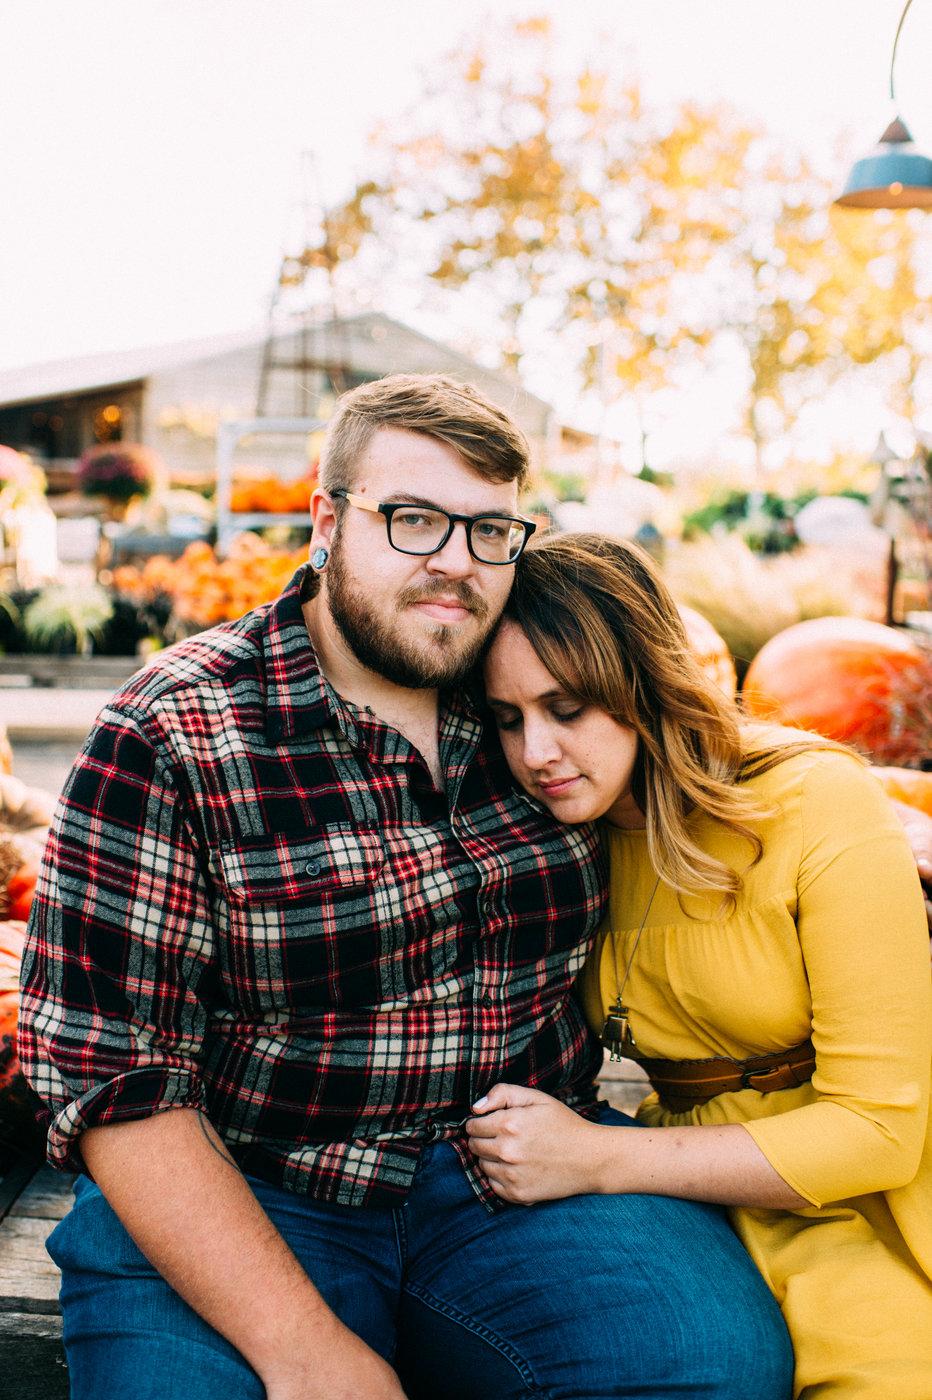 nathan kristi autumn love portraits at terrain-Nathan KristiPortraitED-0051.jpg